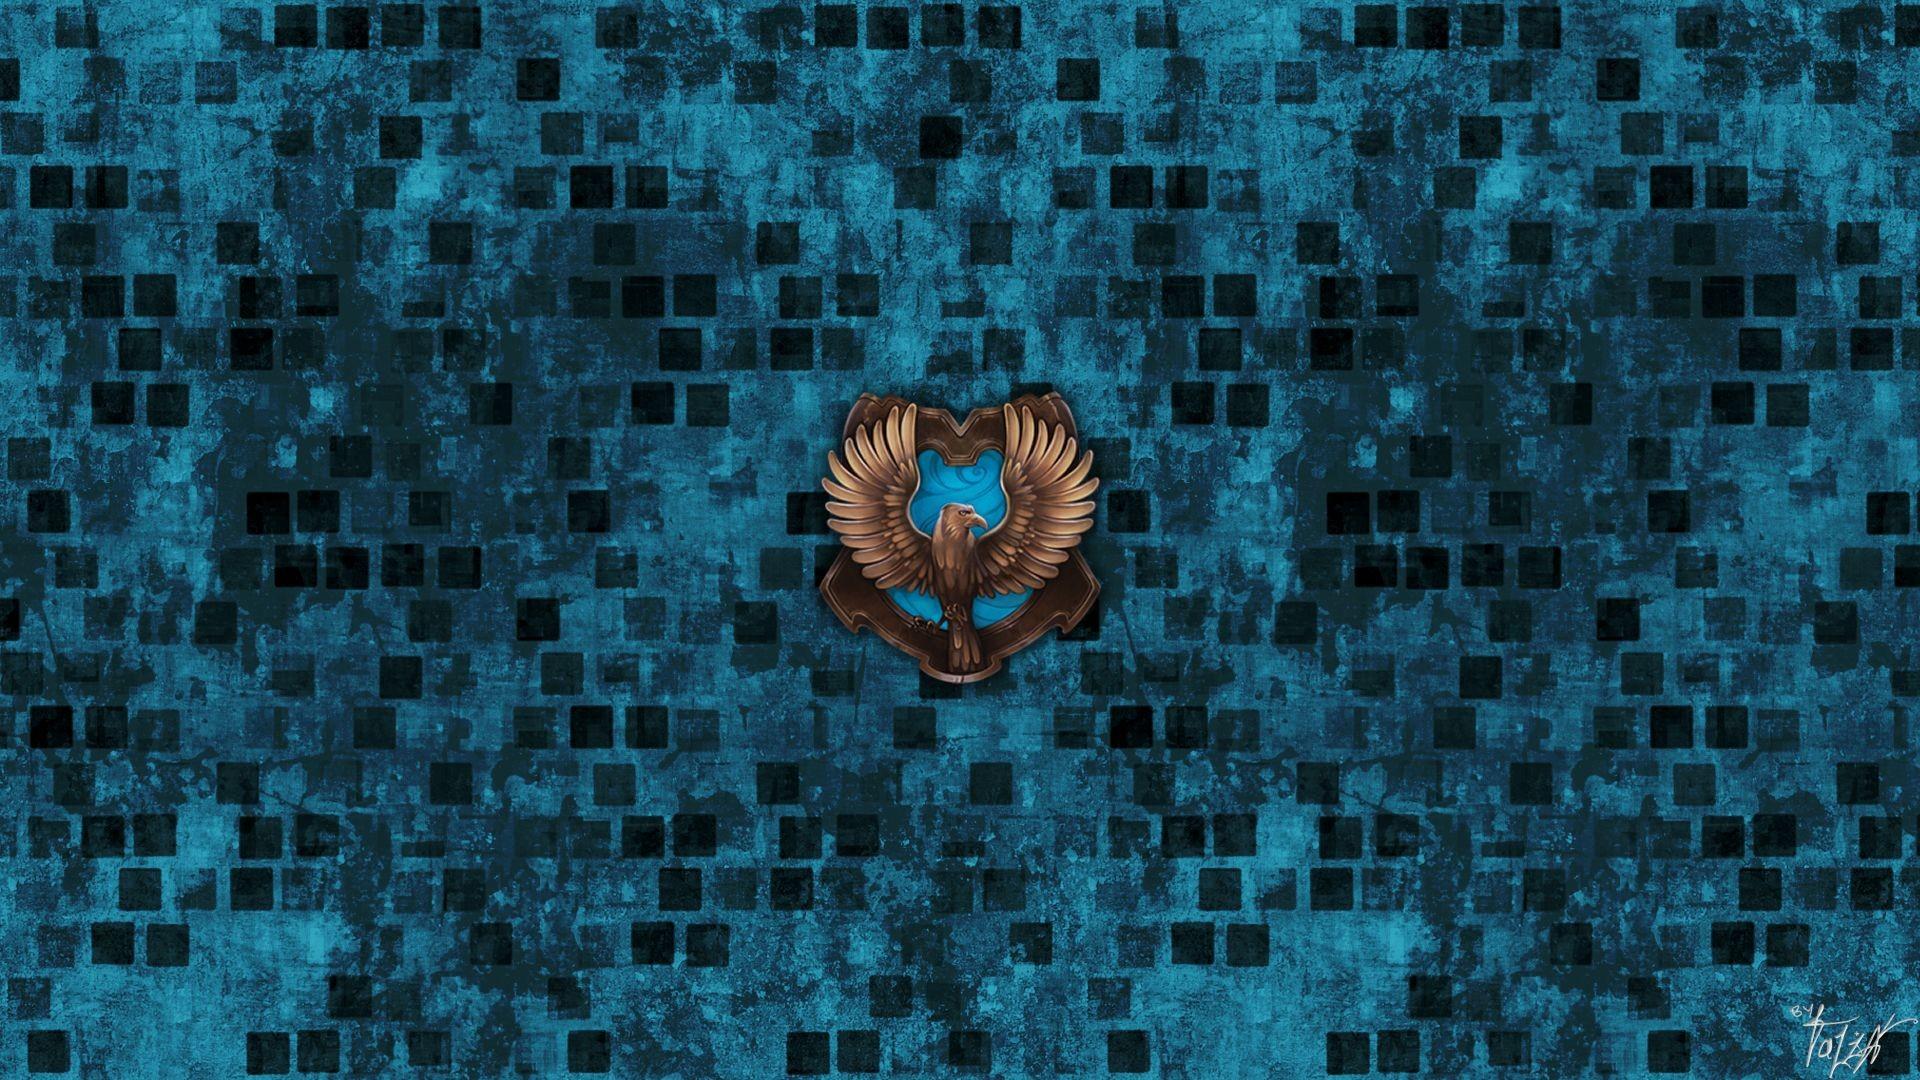 Res: 1920x1080, Ravenclaw - brick background   Ravenclaw - Fink   Pinterest .